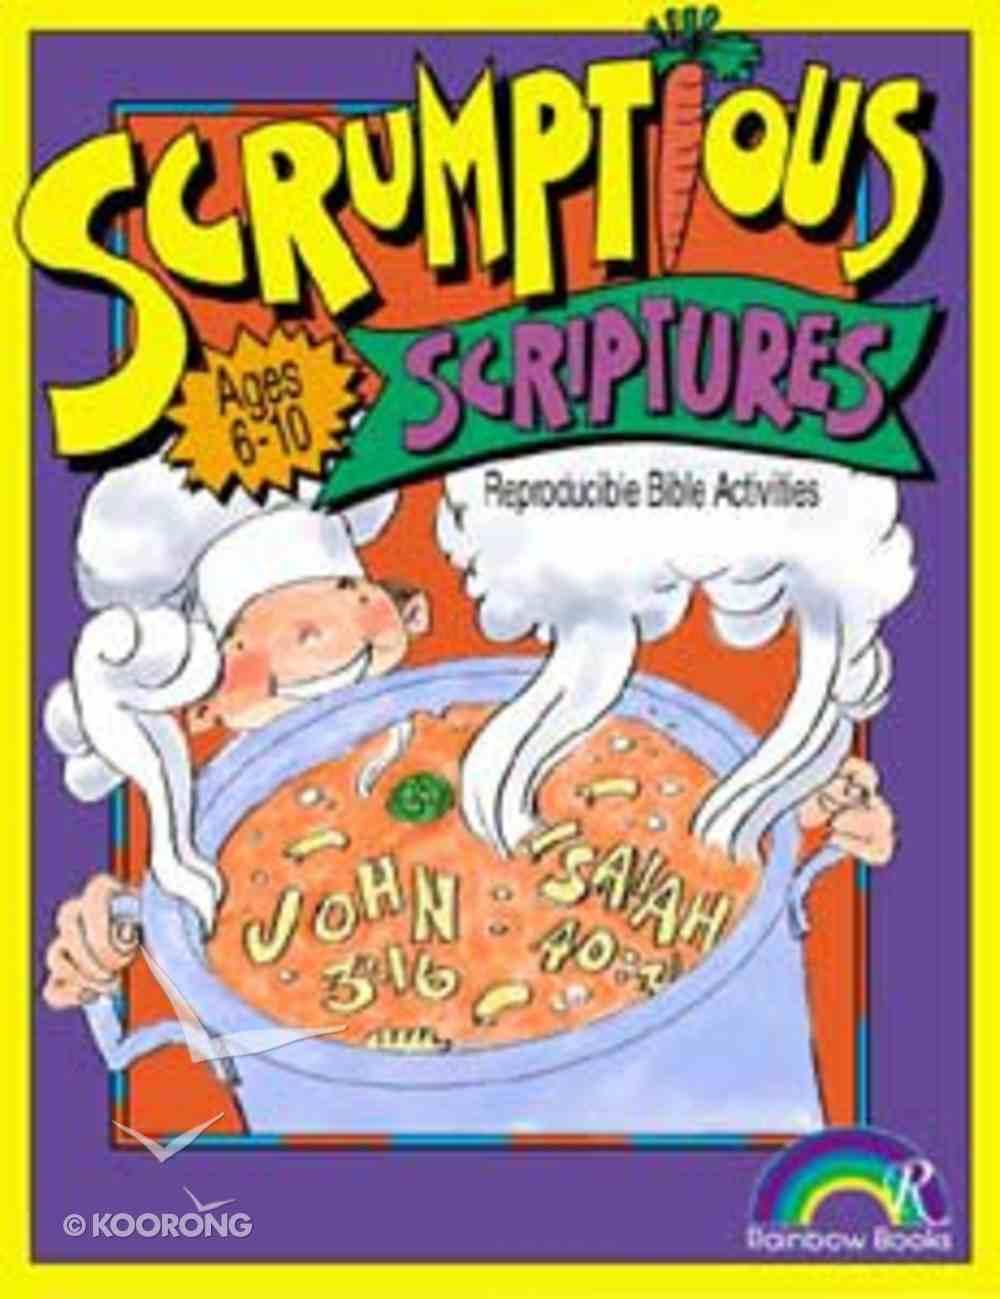 Scrumptious Scriptures: Ages 6-10 (Reproducible) Paperback